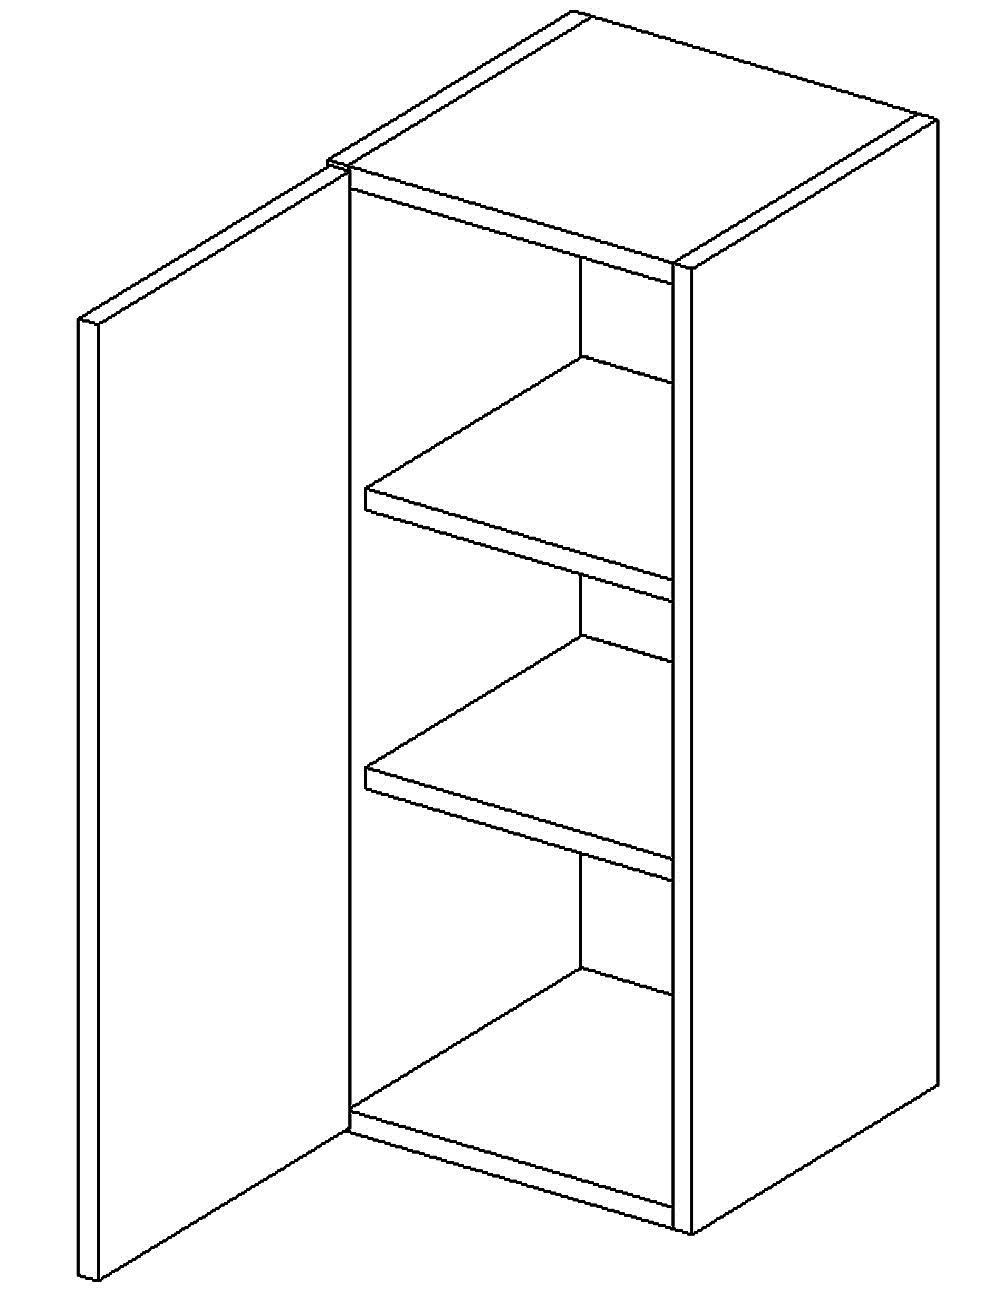 W30 h. skříňka levá PAULA šedá/mat. šedá